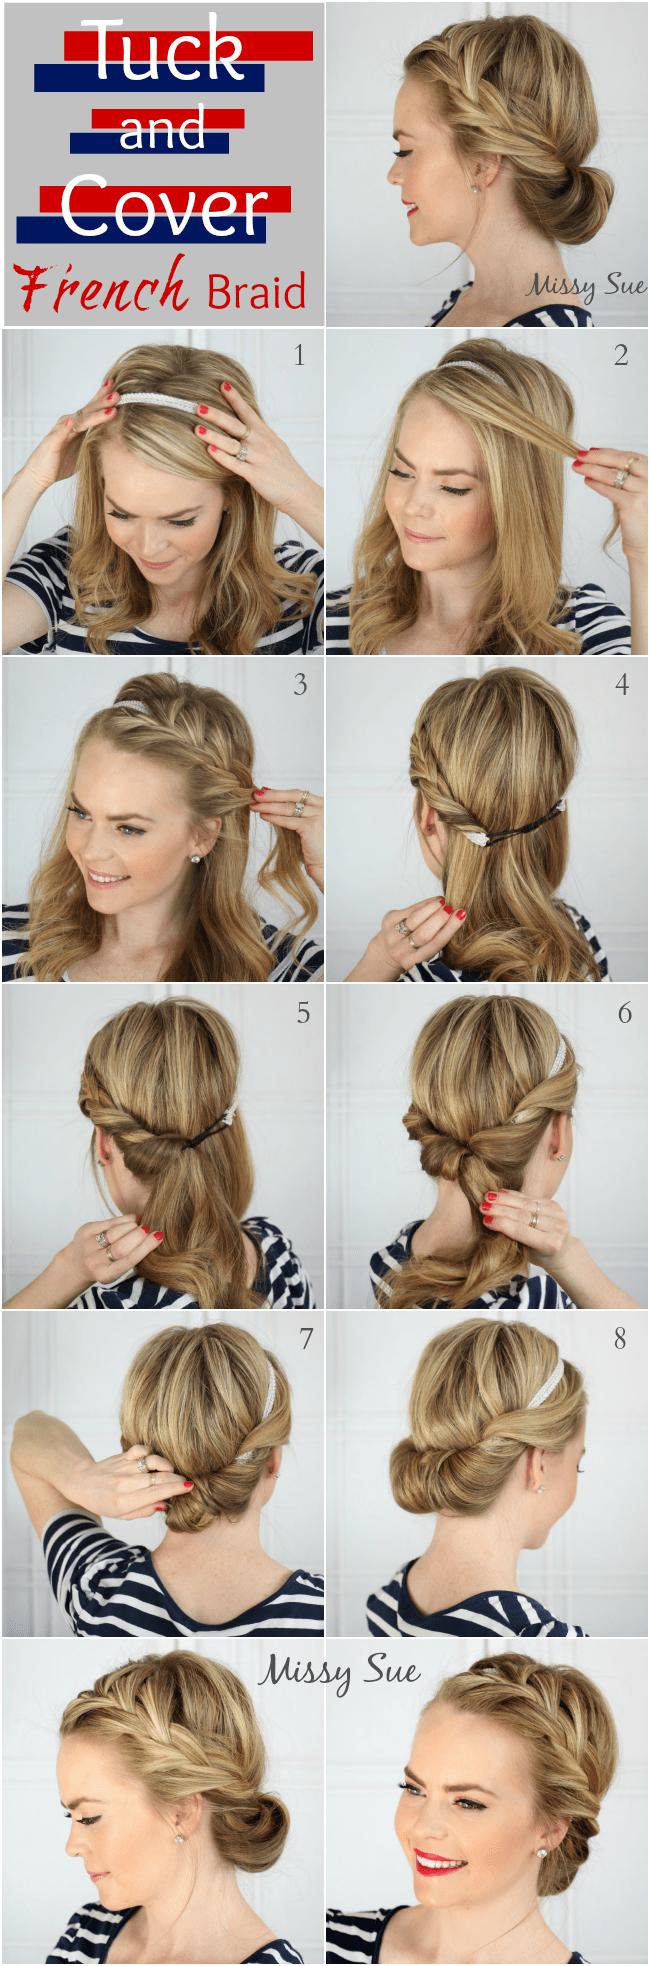 Pleasant How To Do A French Braid Easy Hair Tutorial Best Hairstyles 2017 Short Hairstyles Gunalazisus